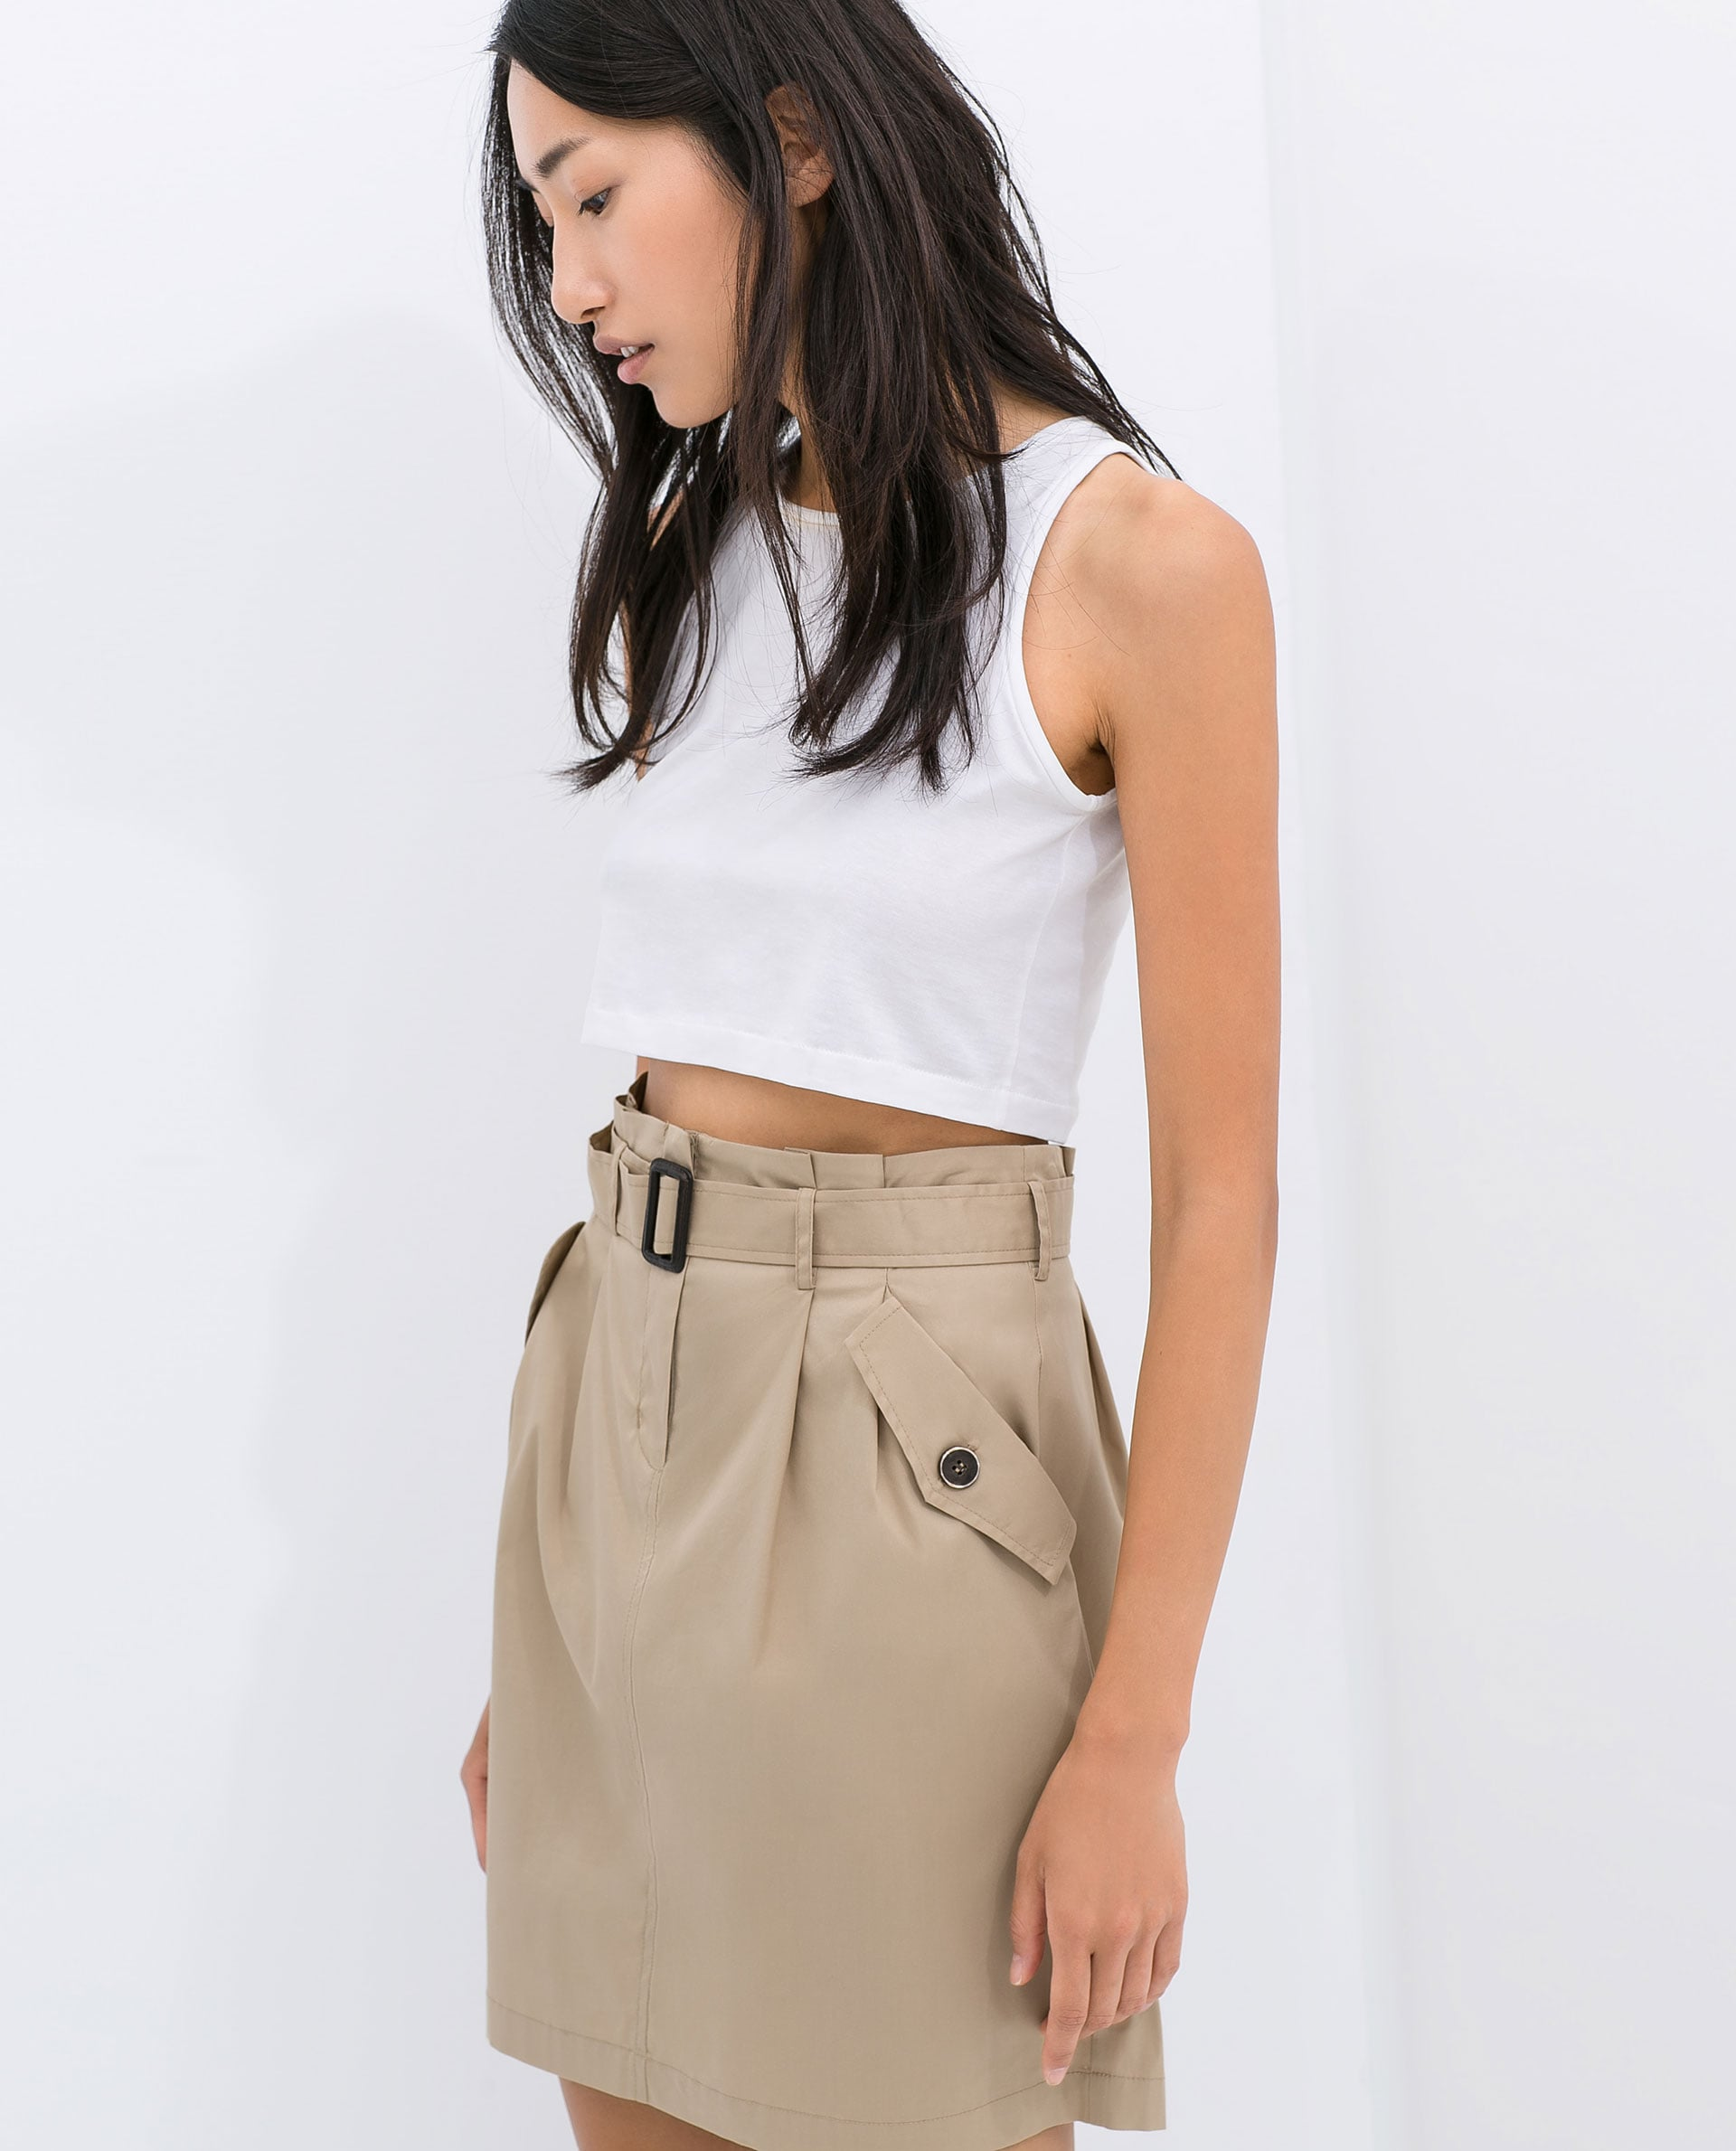 Zara Poplin Skirt With Belt ($60)